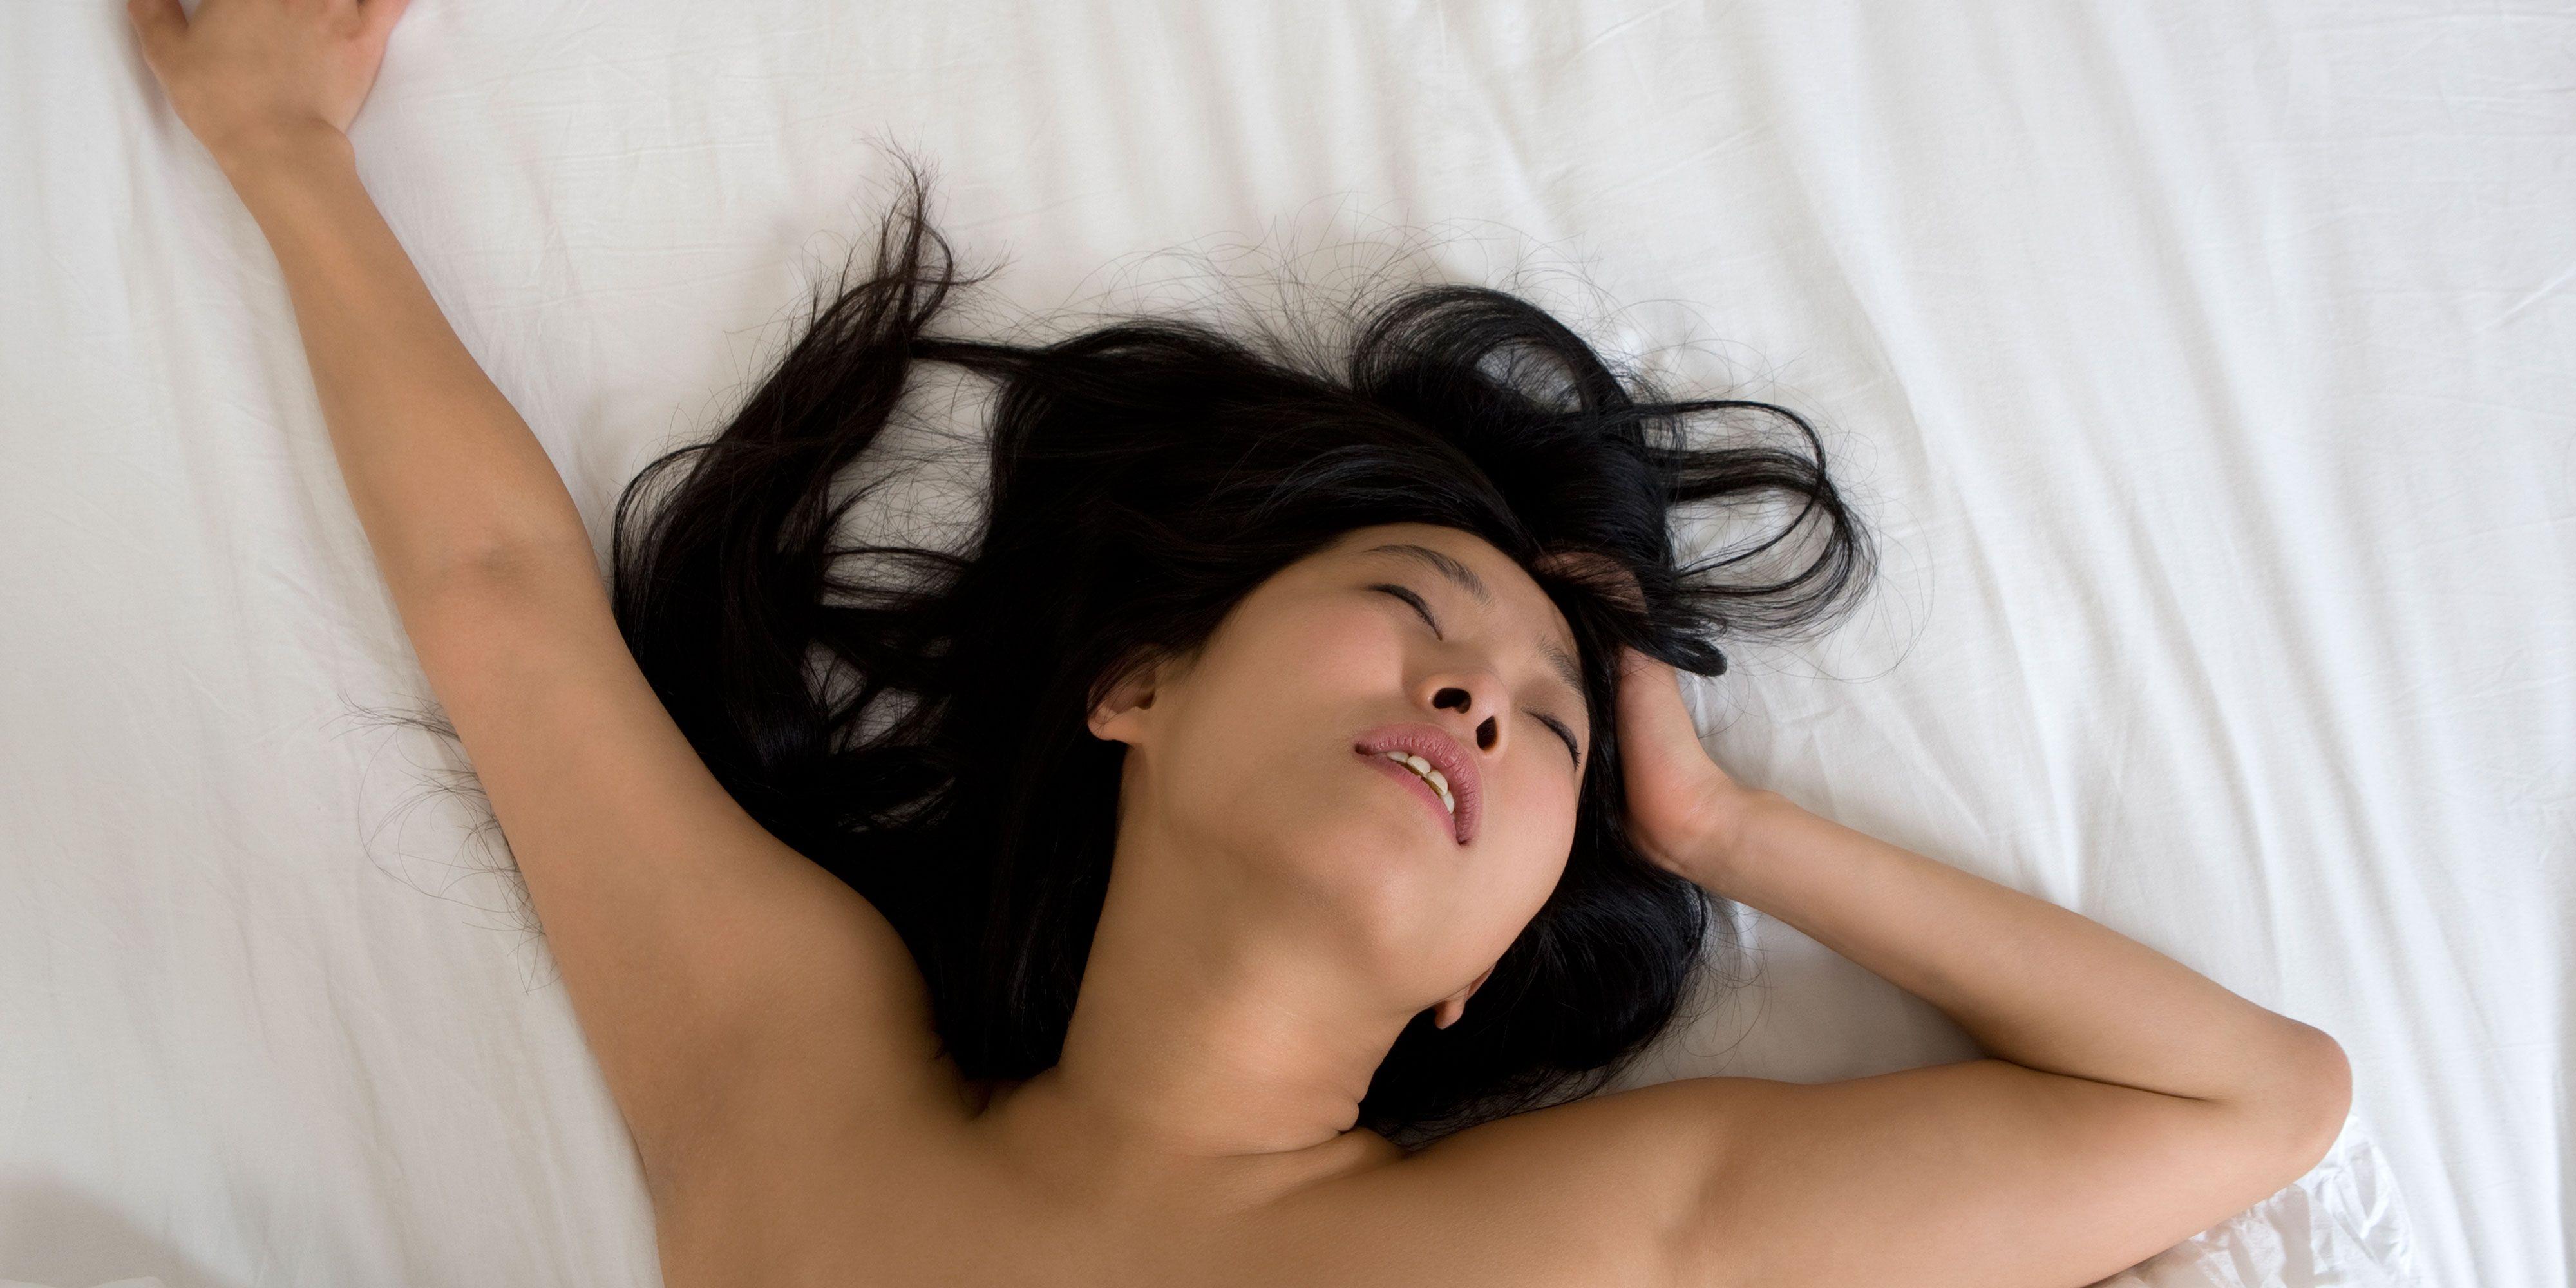 Coconut oil vaginal irritation